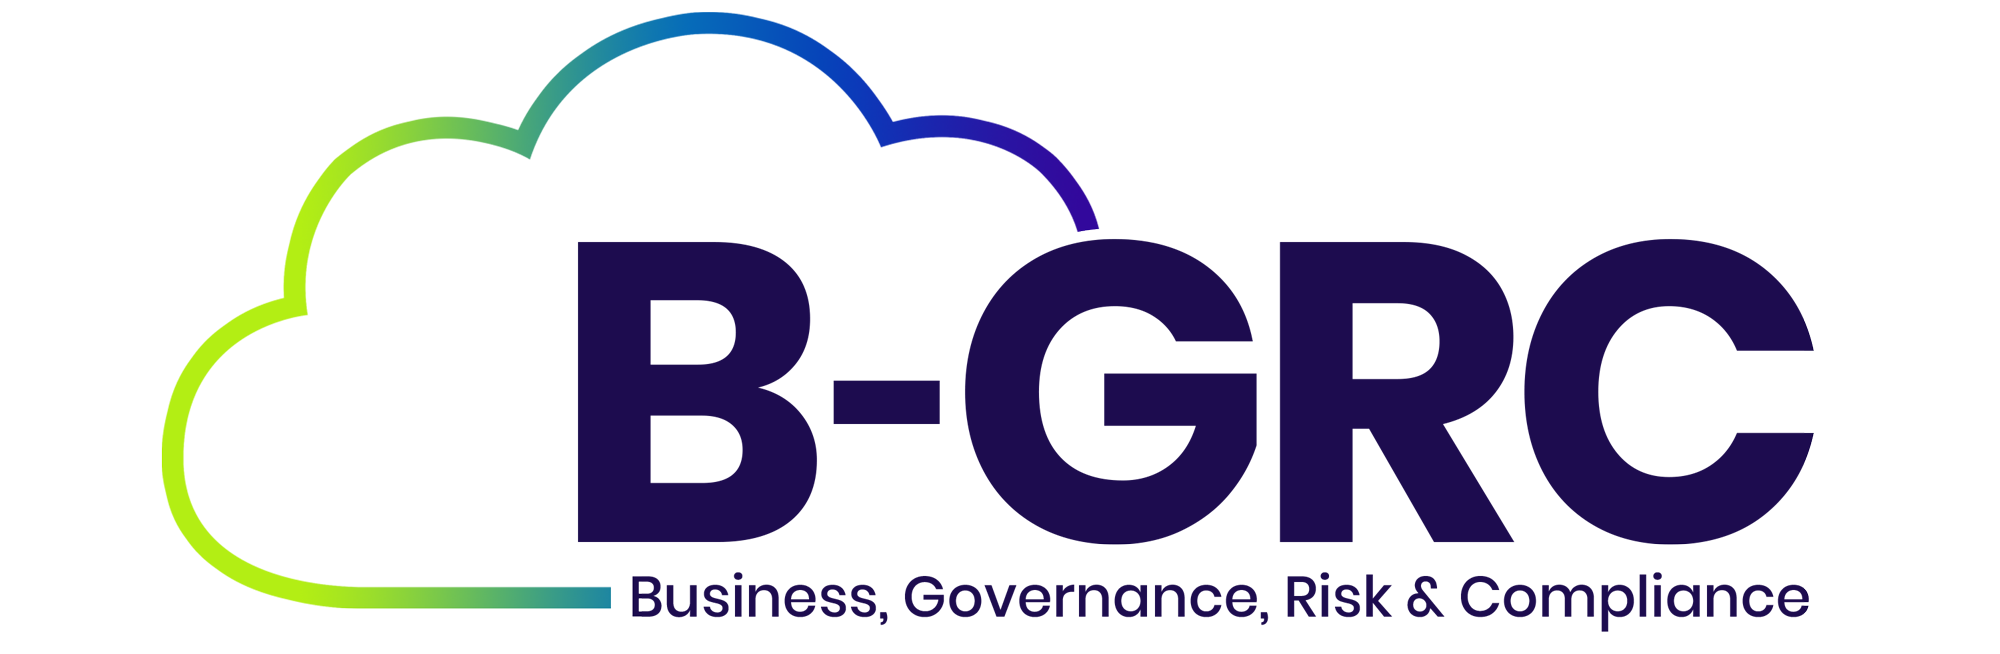 B-GRC